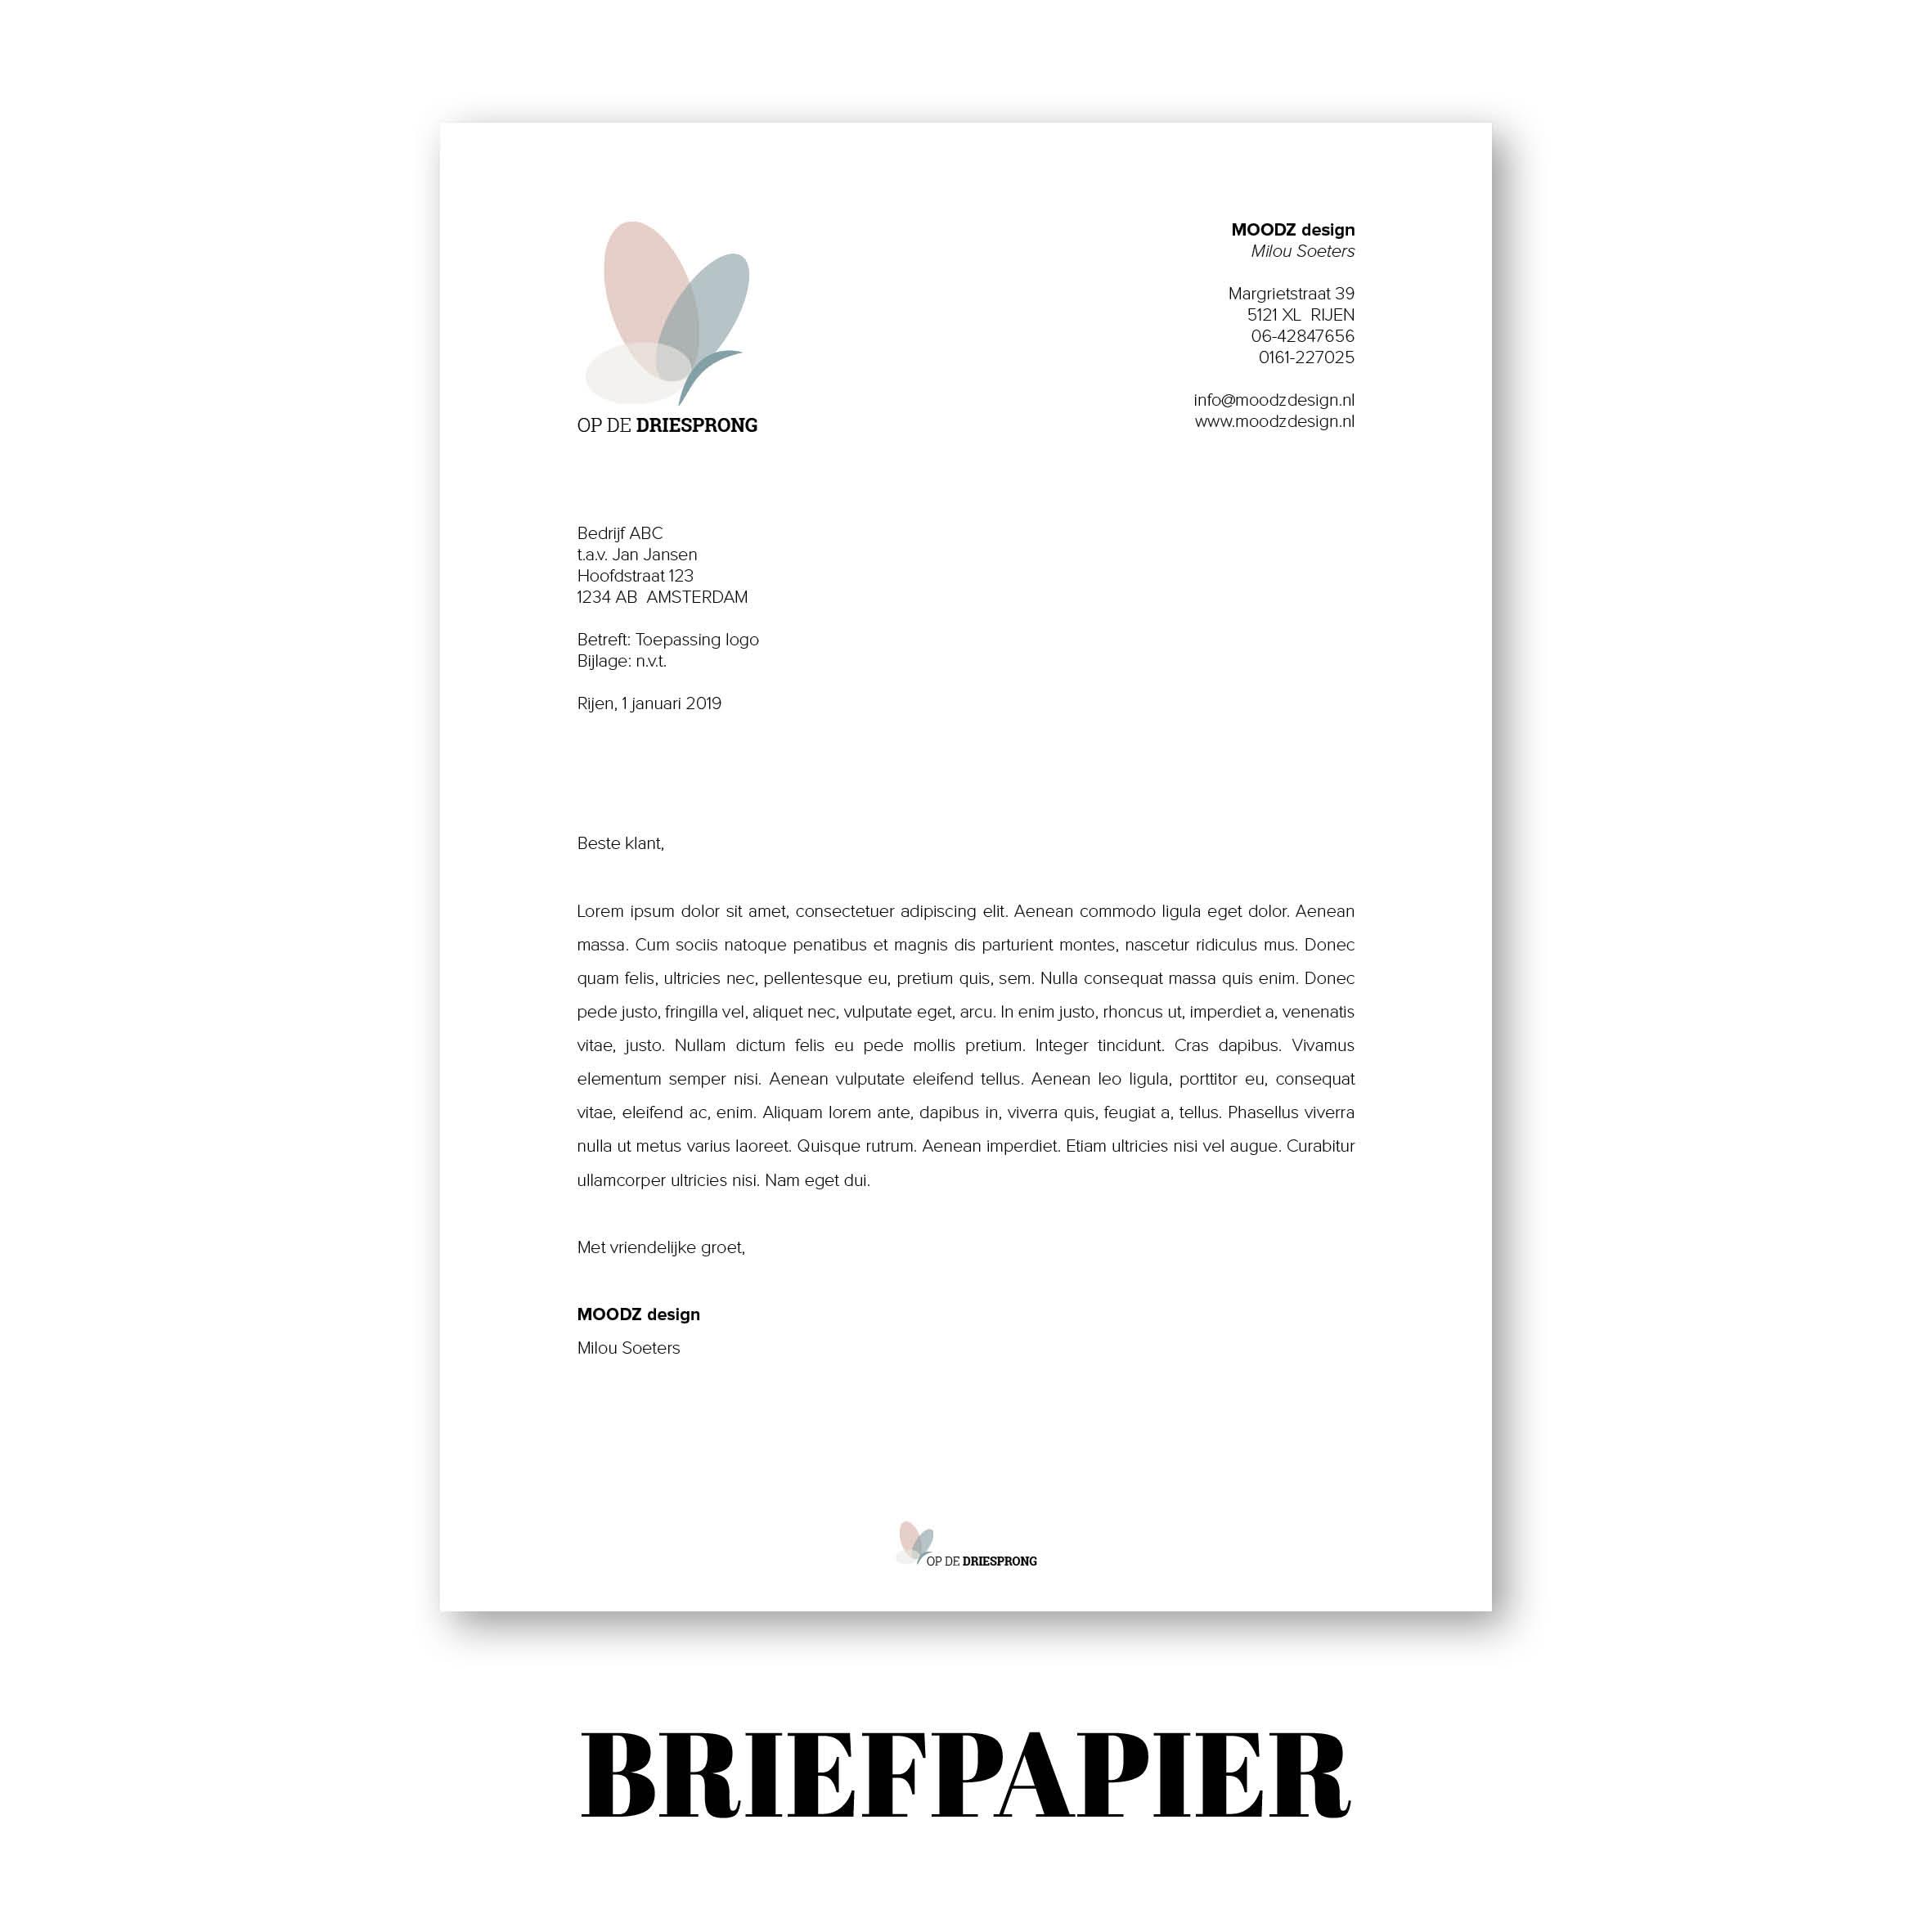 briefpapier ontwerp, briefpapier op maat